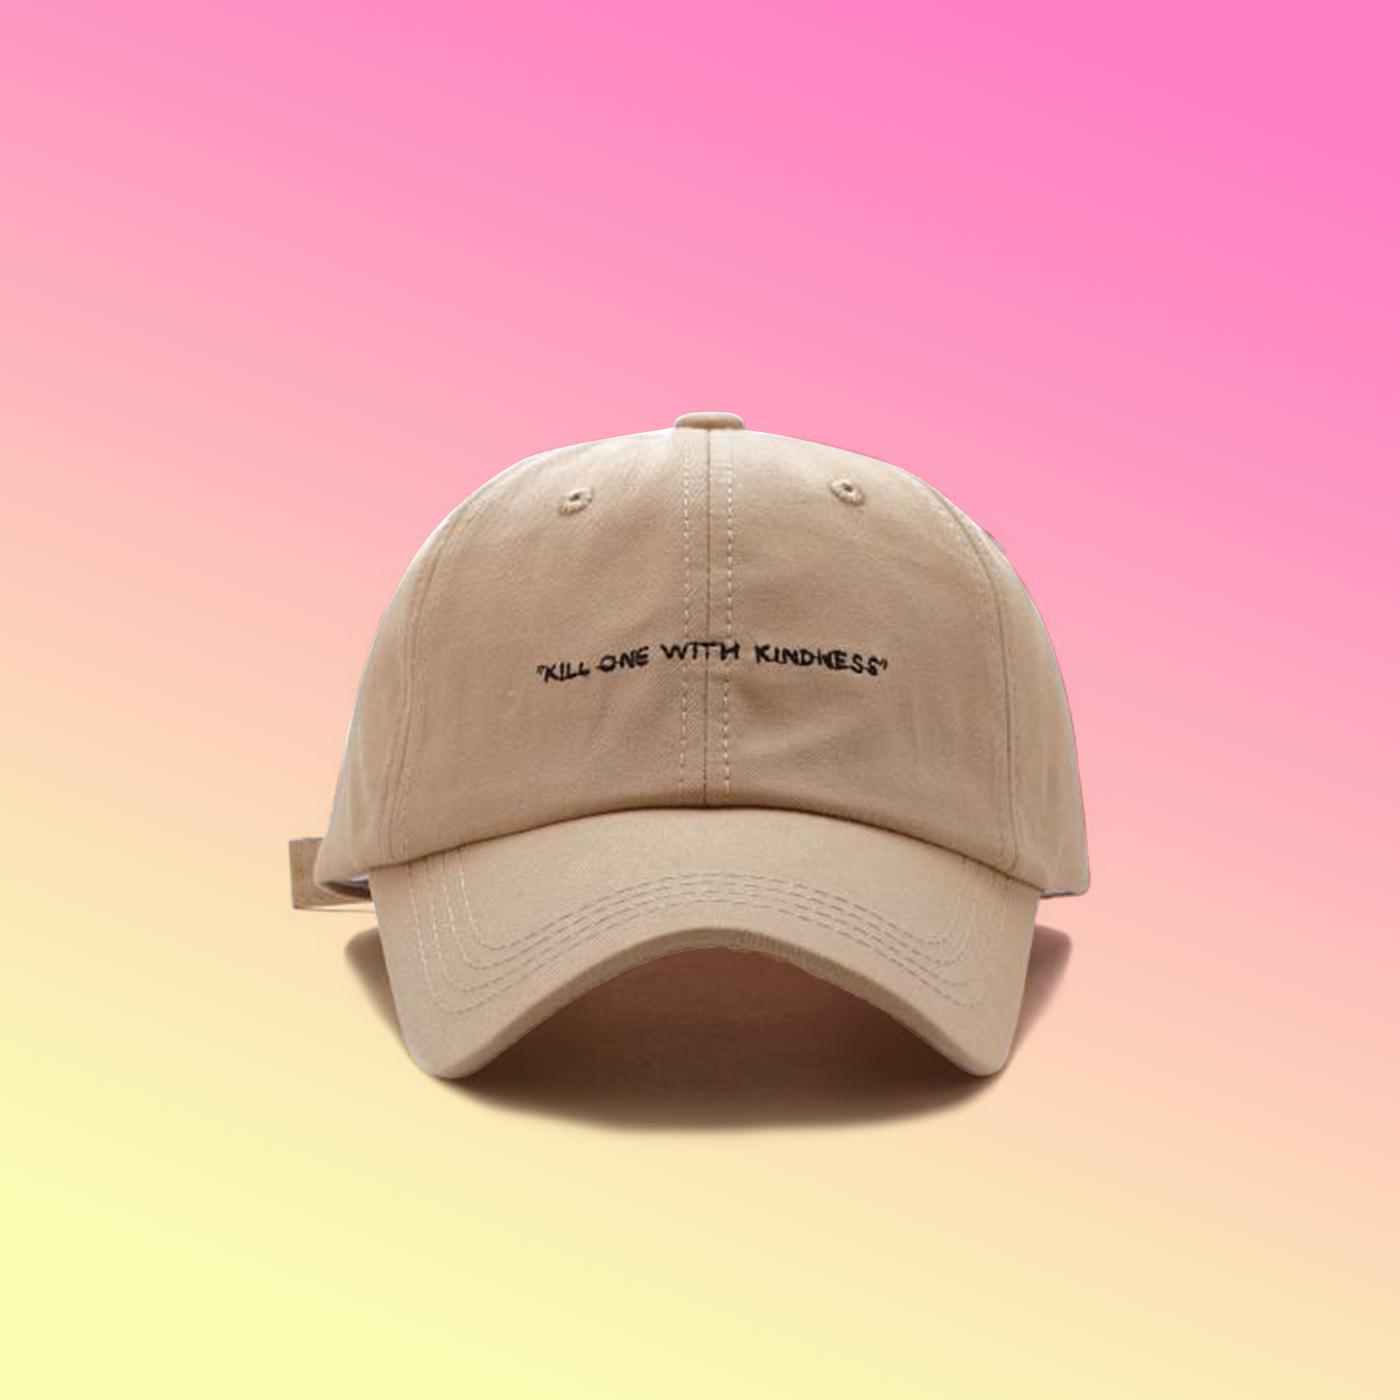 cbfdfb41ec8 KILL ONE WITH KINDNESS BASEBALL CAP KHAKI · soldrelax · Online Store ...